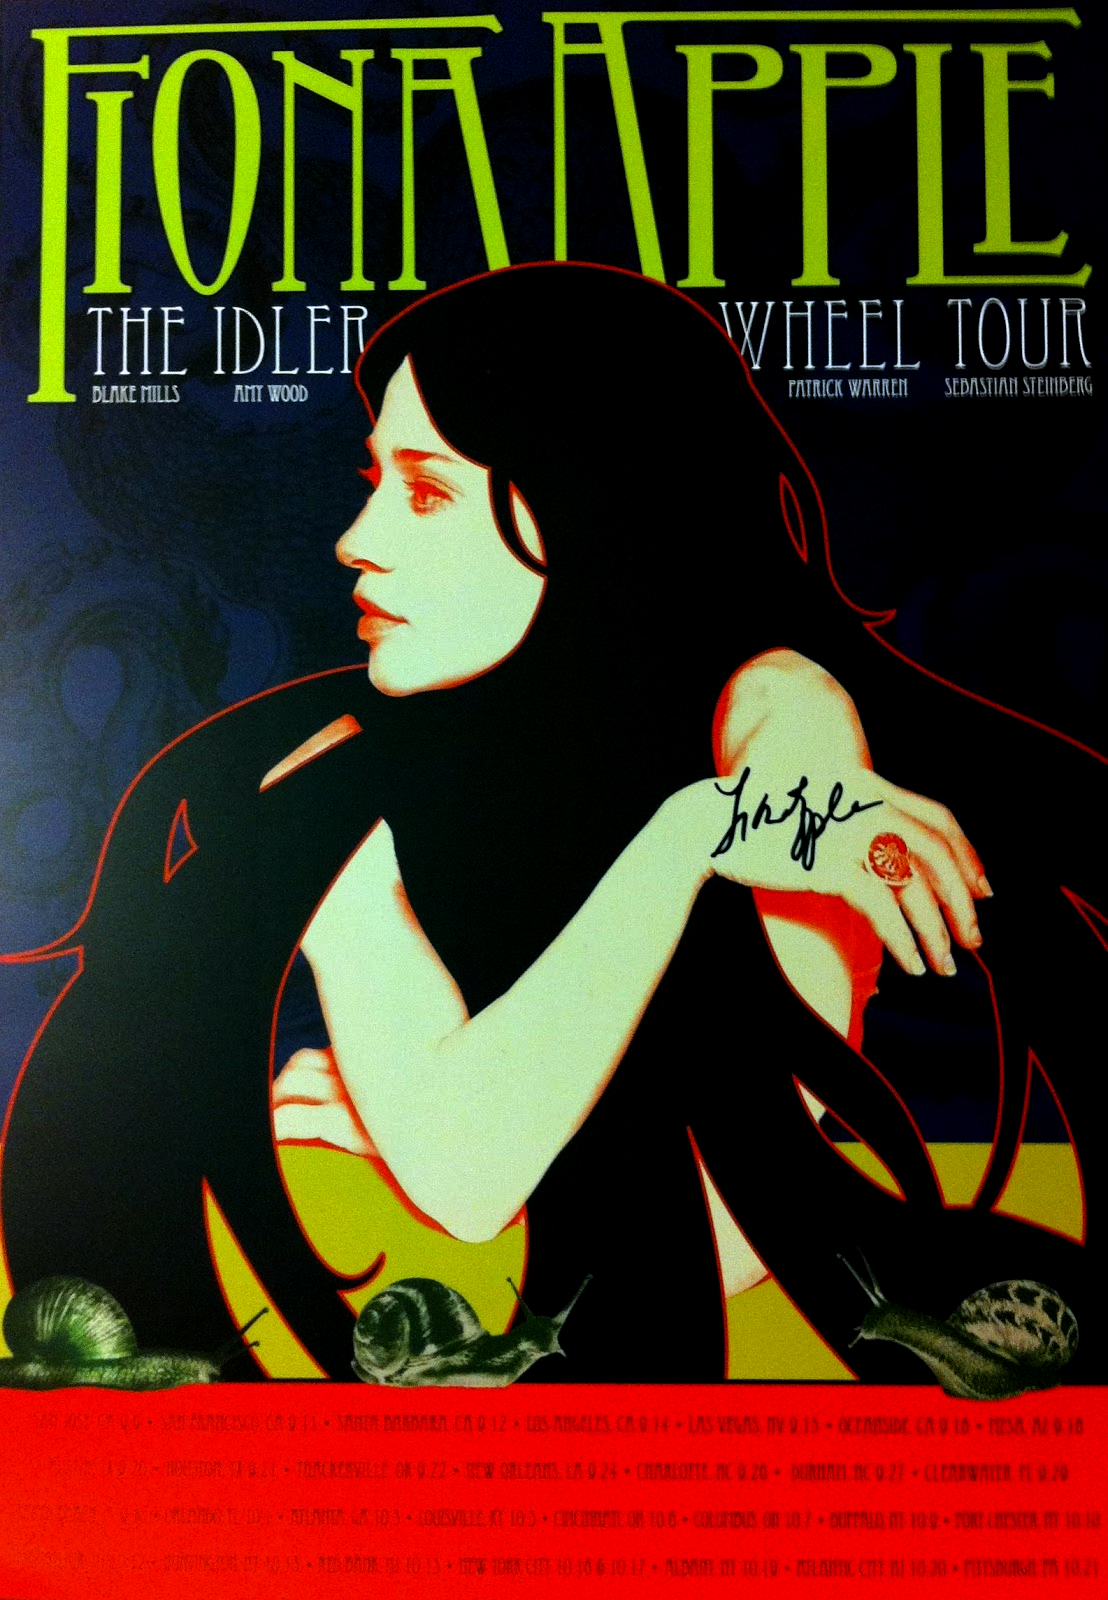 fiona tour poster.jpg